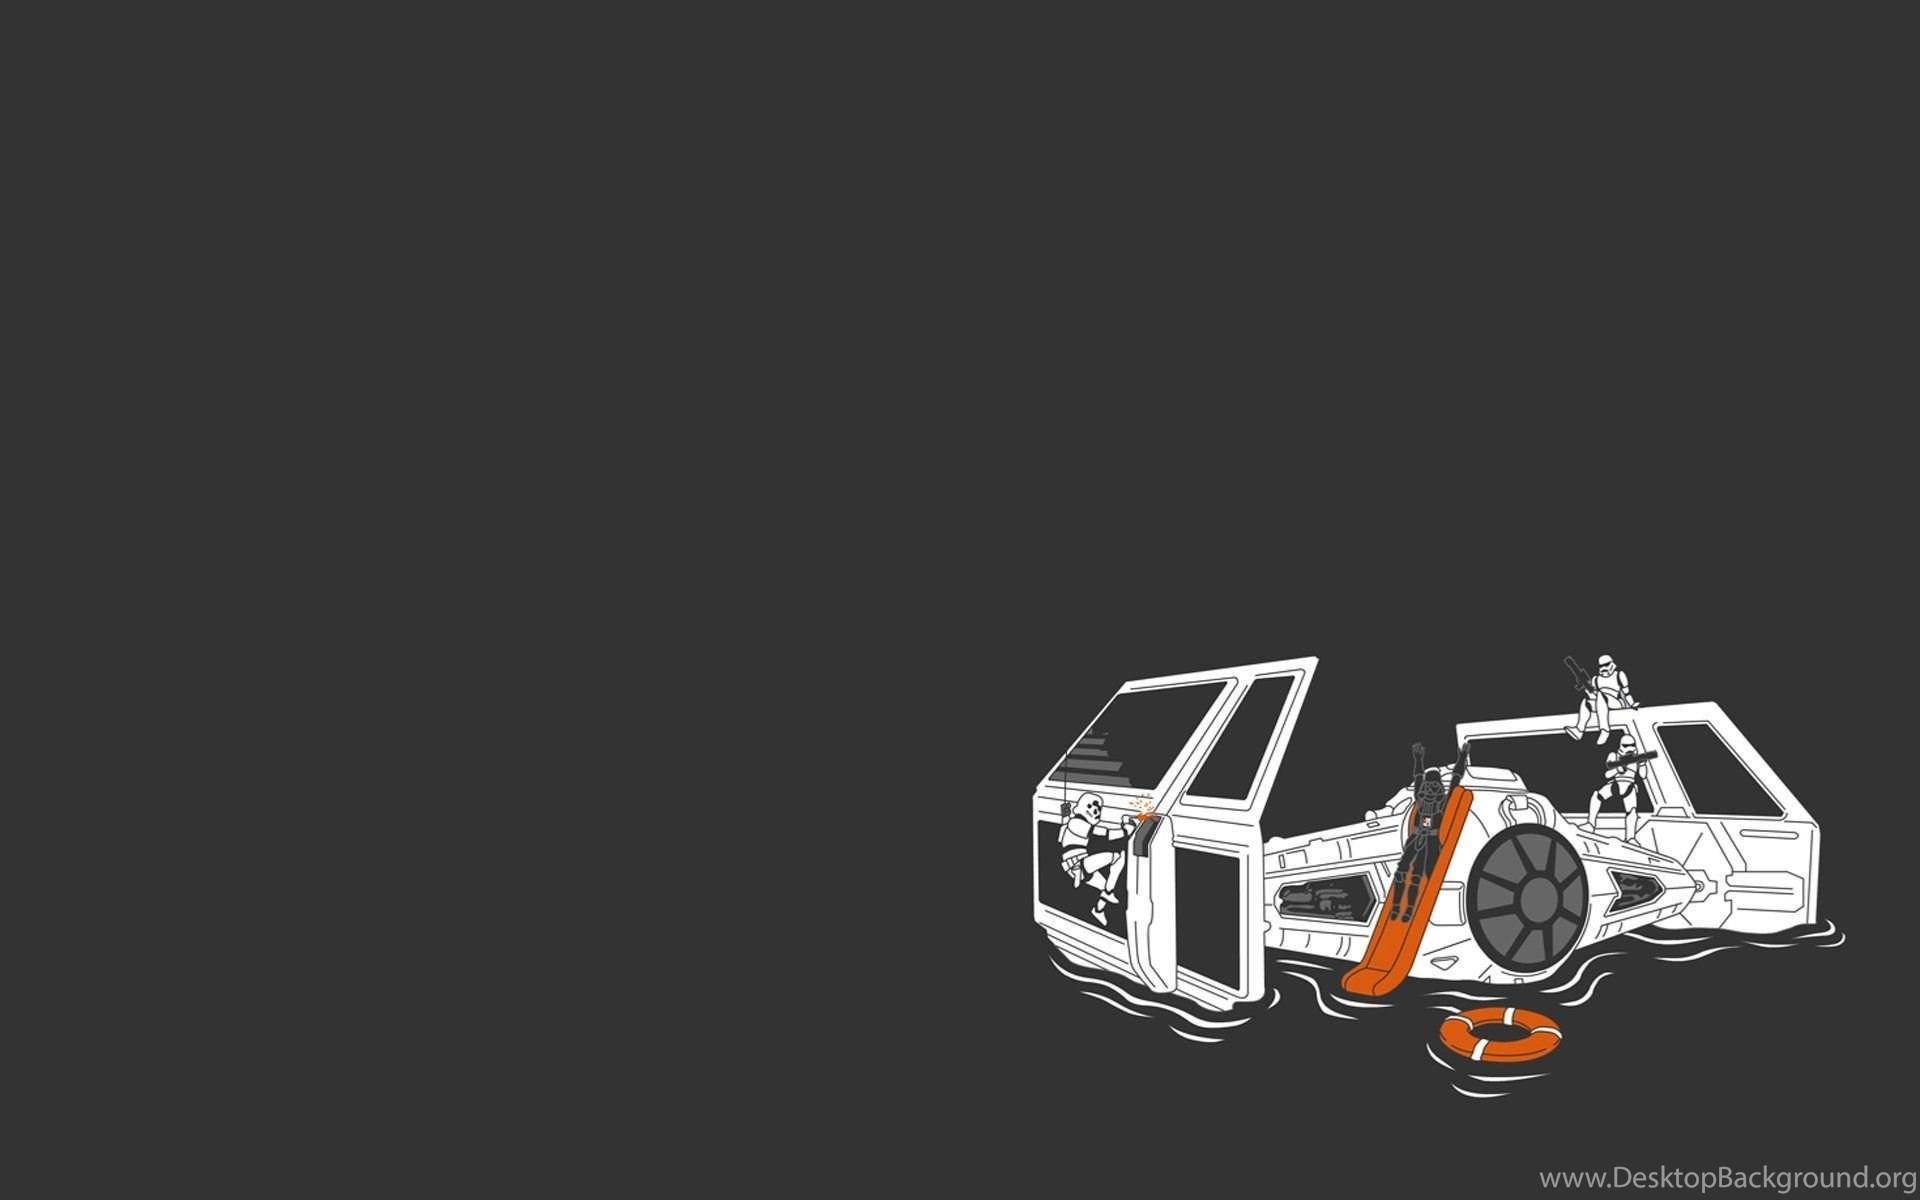 Star Wars Backgrounds Wallpapers Walldevil Best Free Hd Desktop Desktop Background